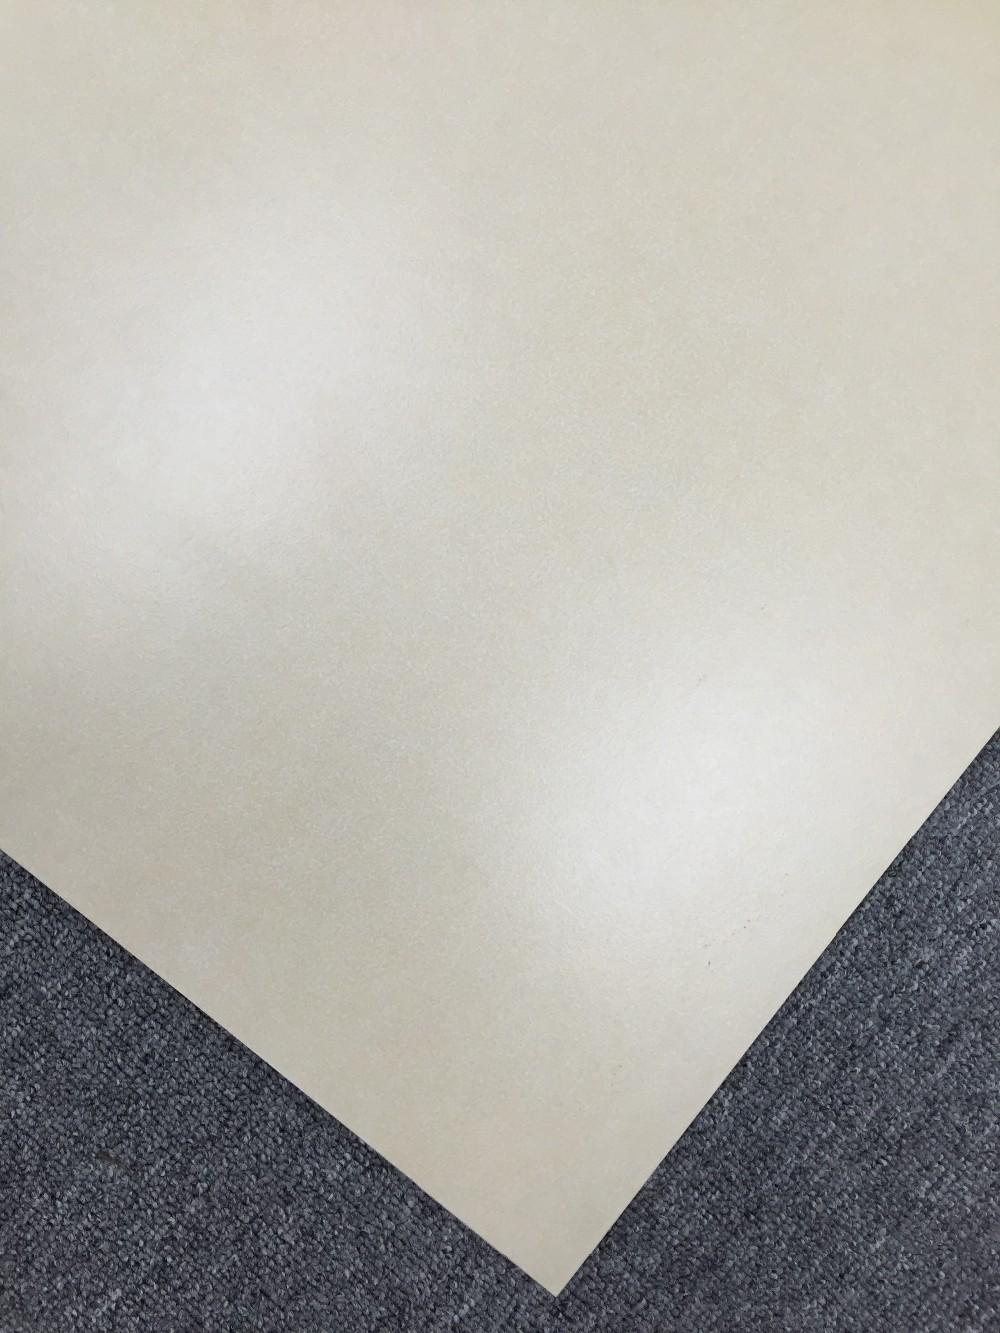 Foshan leveranciers badkamer tegel ontwerp porcelanato 60x60 ...